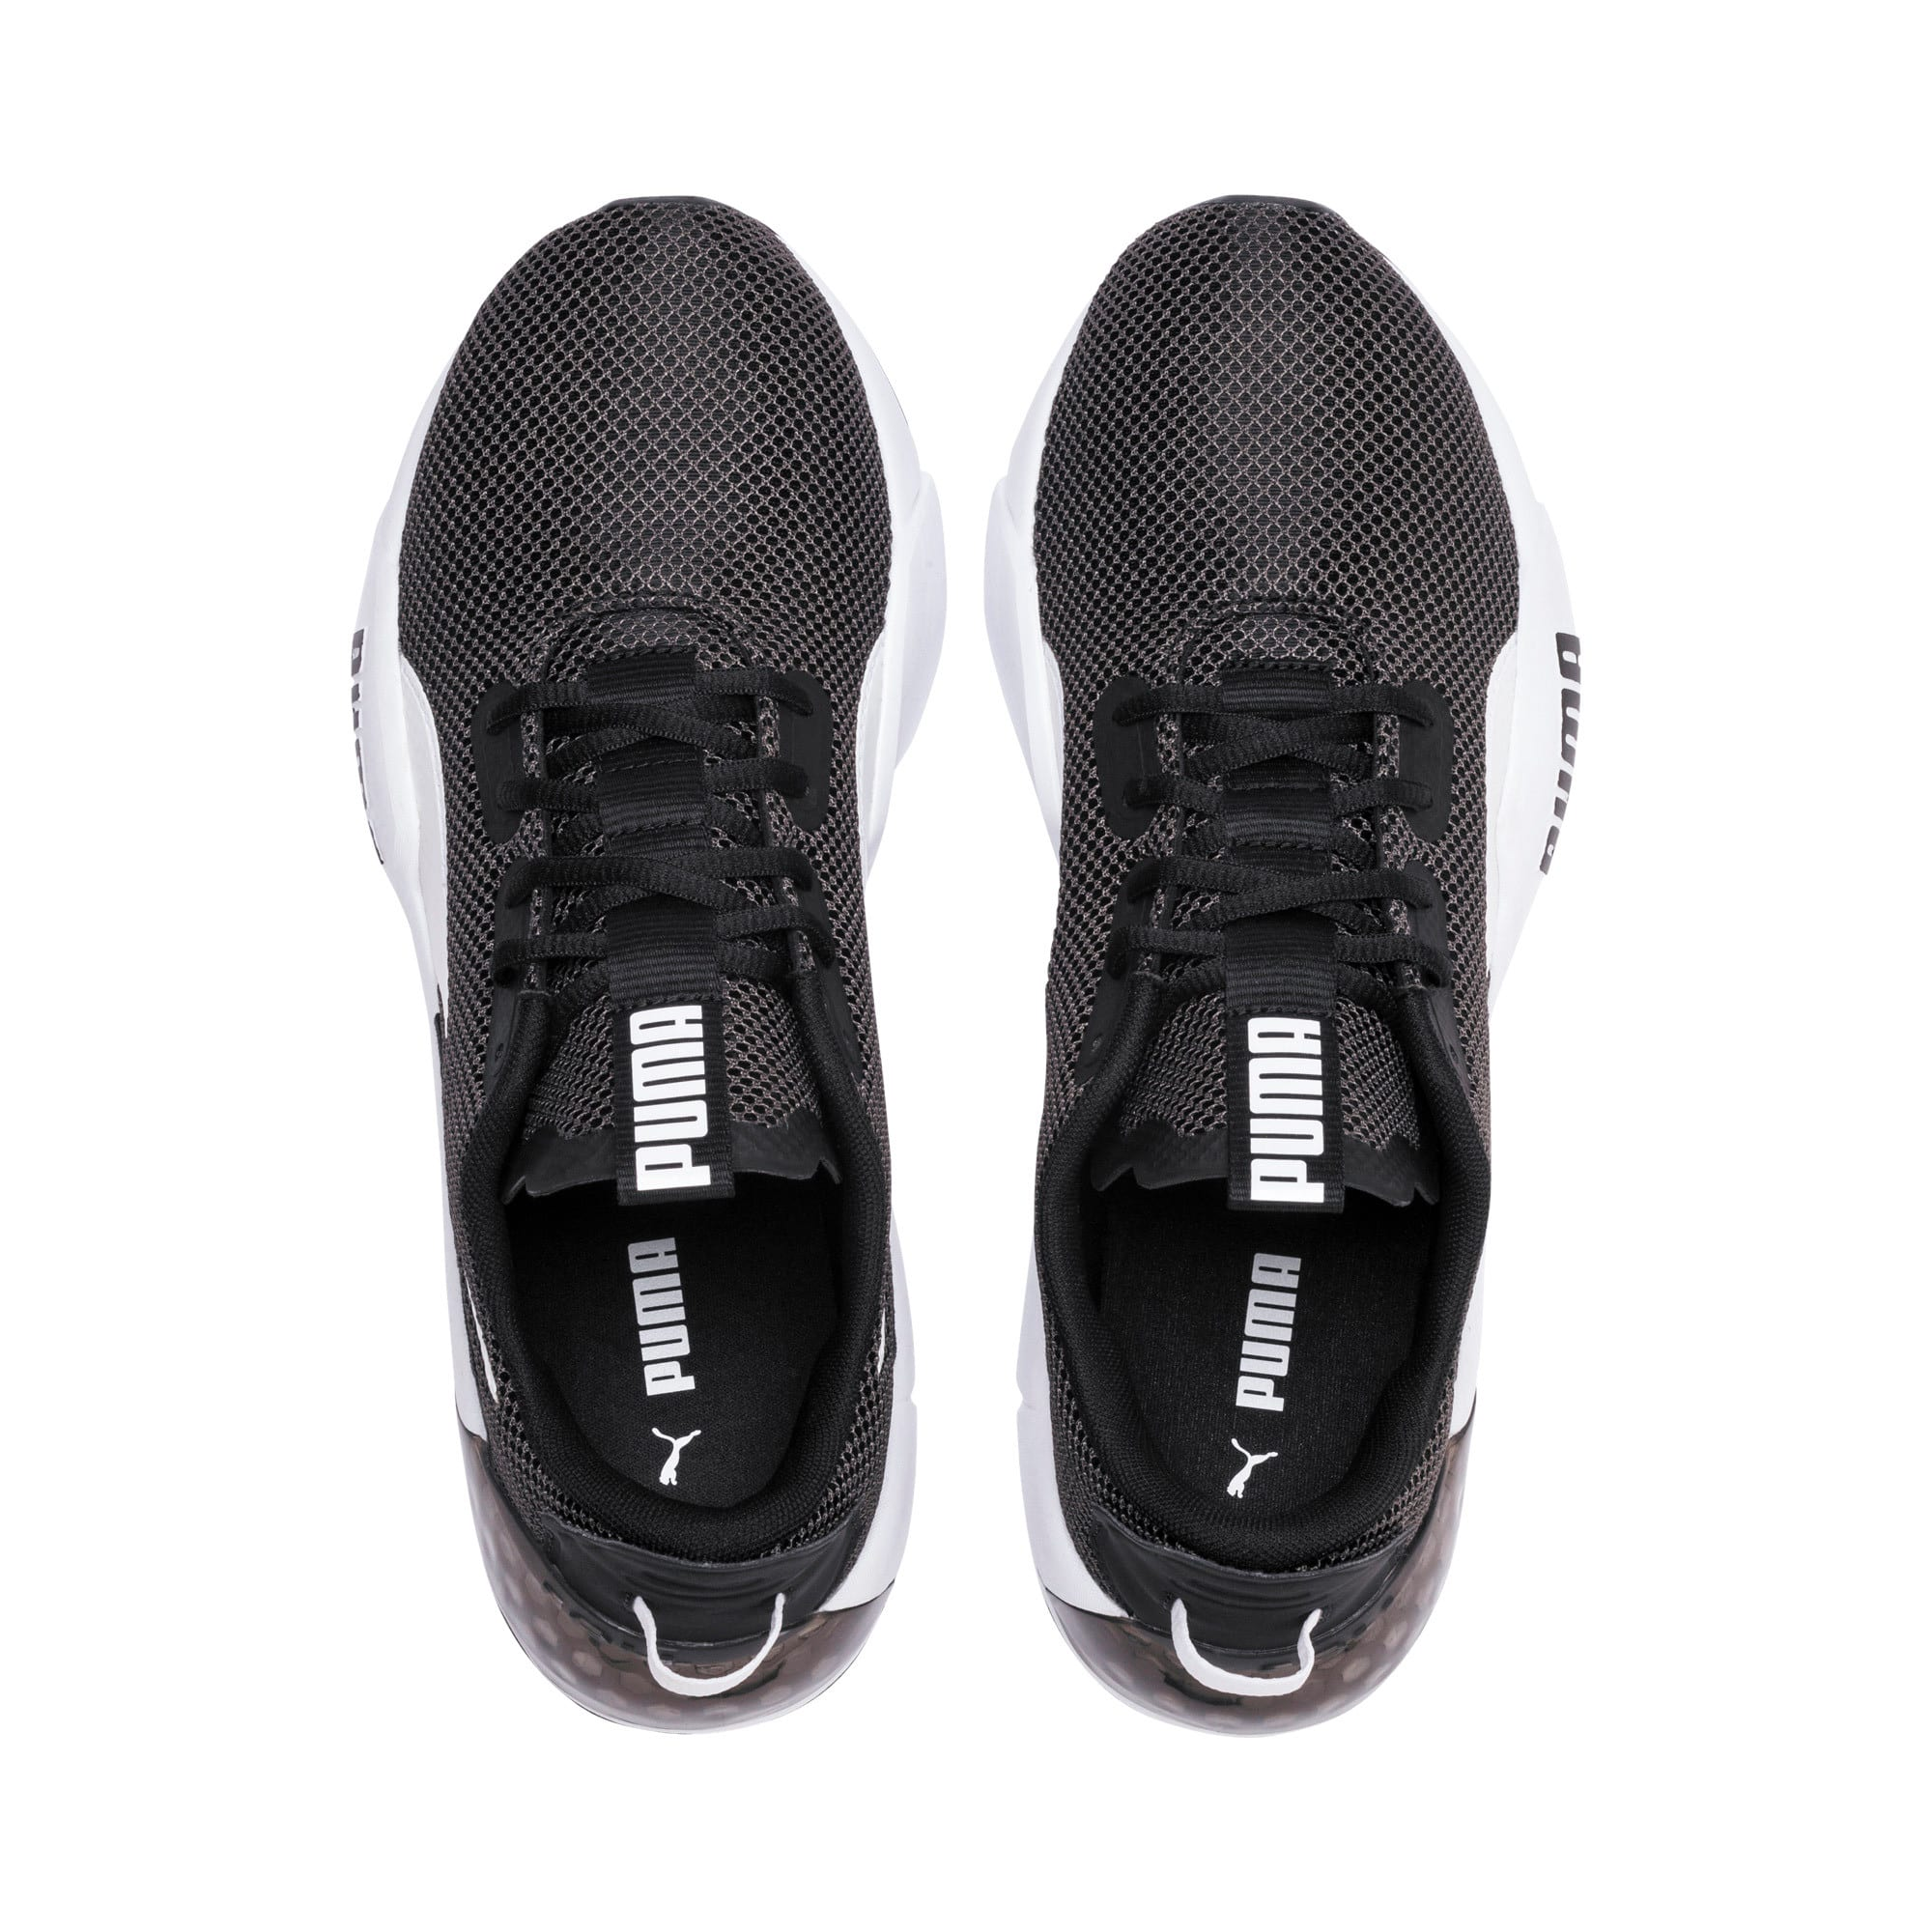 Thumbnail 7 of CELL Phase Men's Training Shoes, Puma Black-Puma White, medium